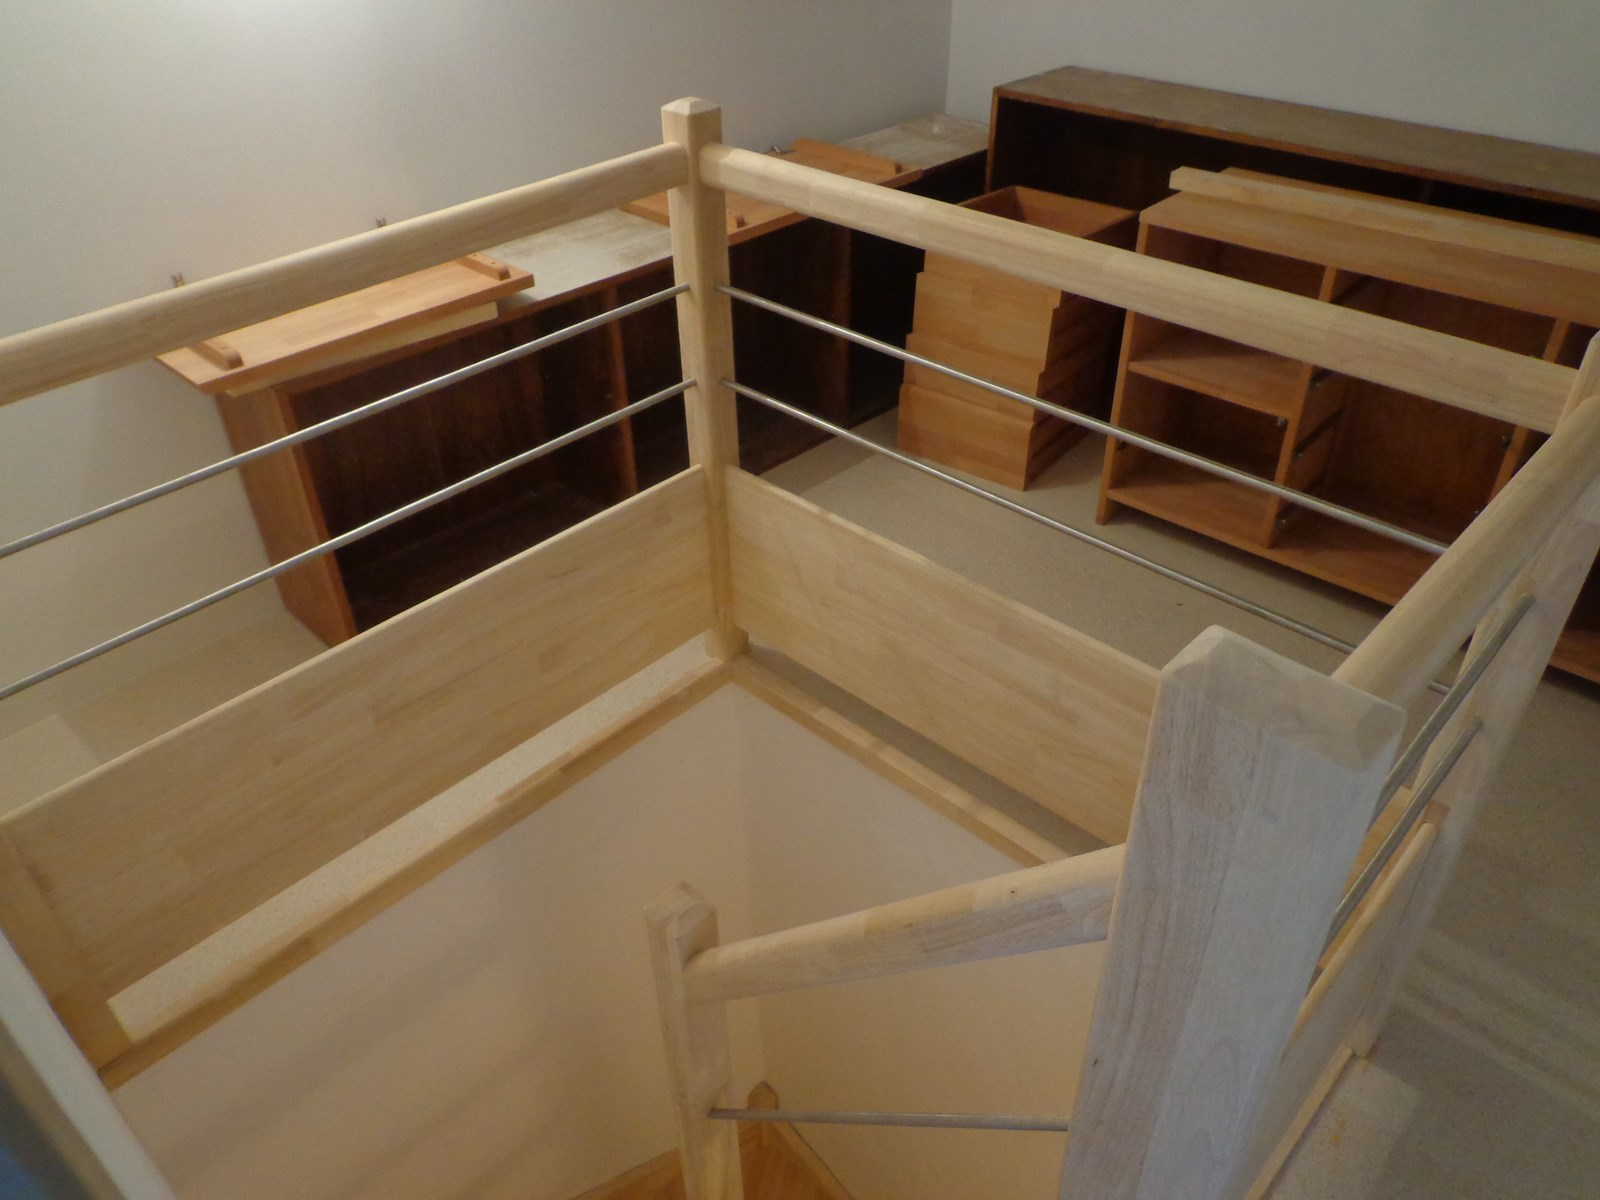 installation garde corps remplissage bois tube inox al s gard uz s nimes. Black Bedroom Furniture Sets. Home Design Ideas